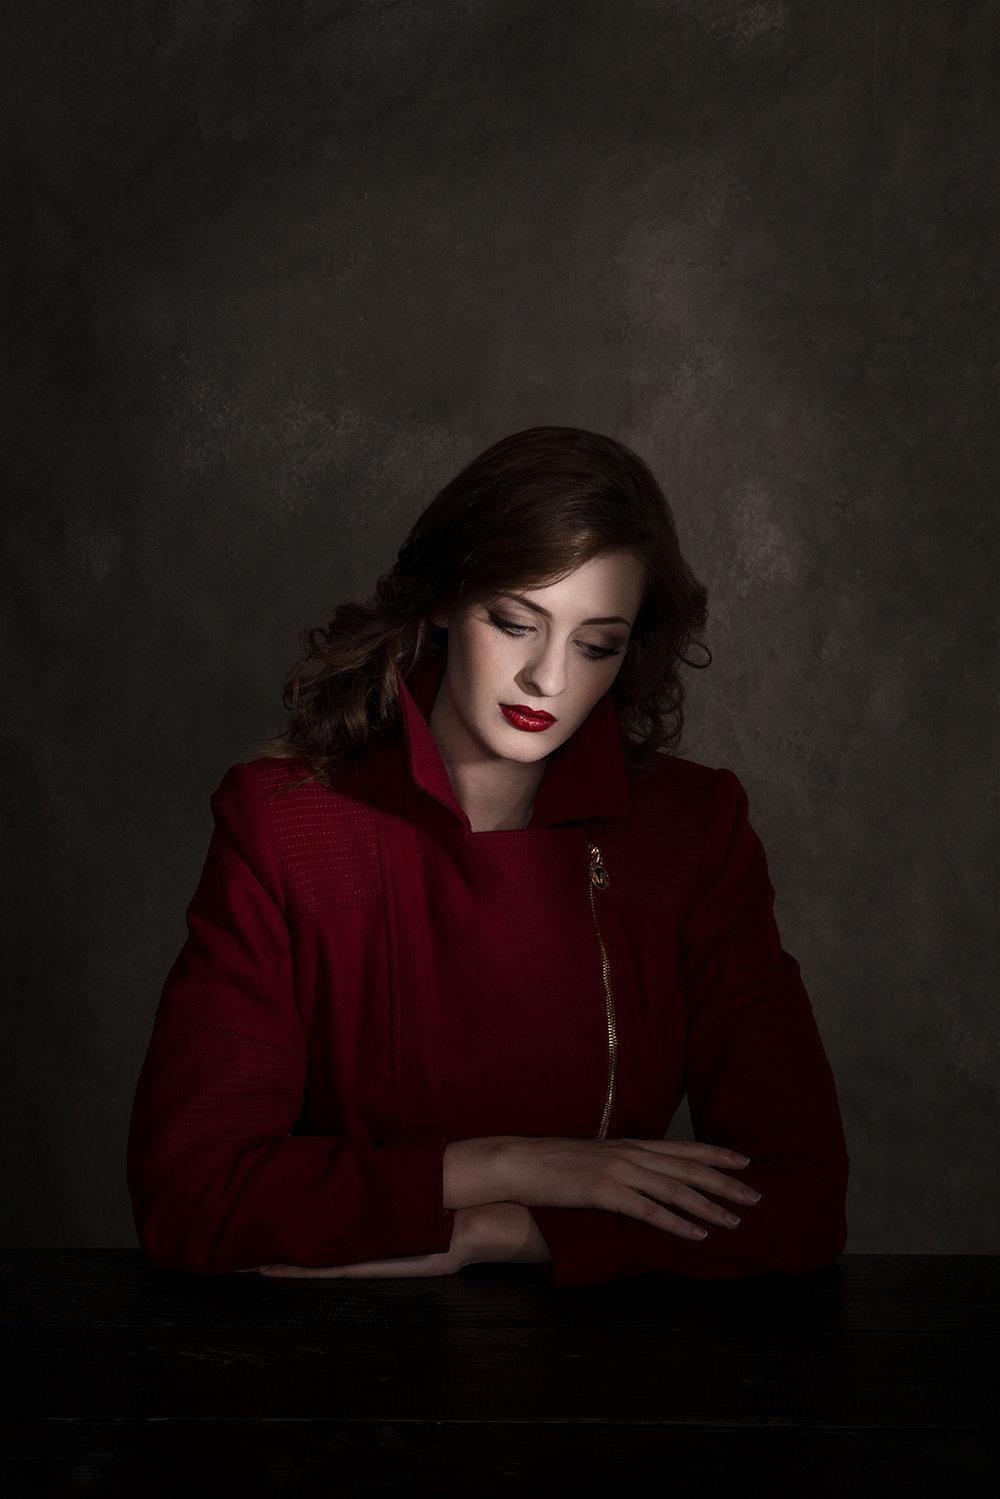 Lisbeth_Portrait_1-WEB.jpg